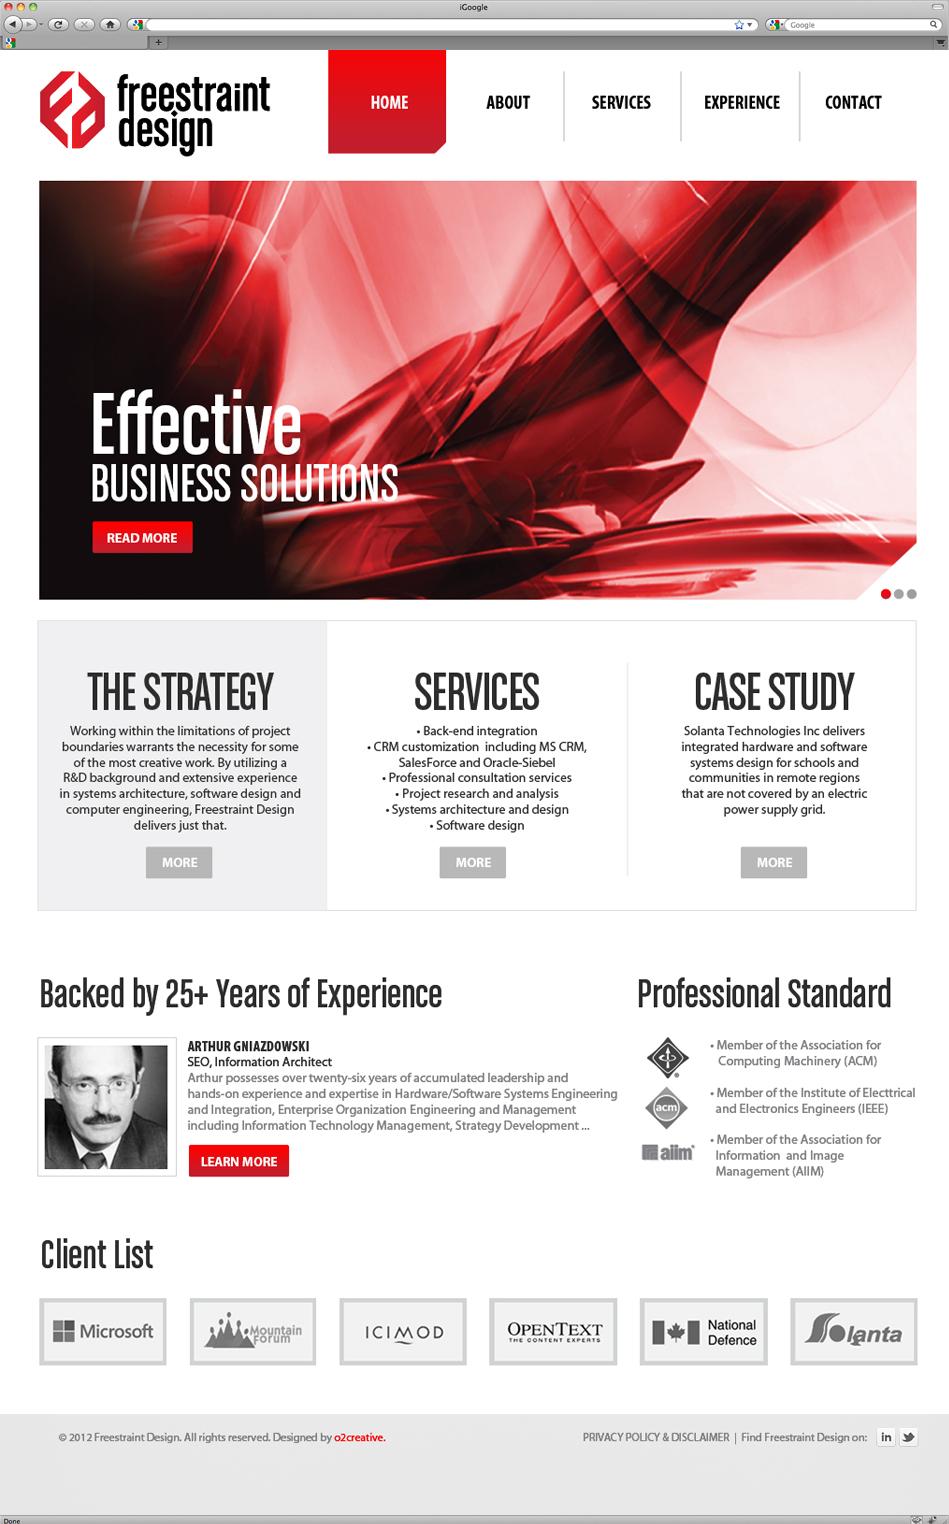 Freestraint Design website interface